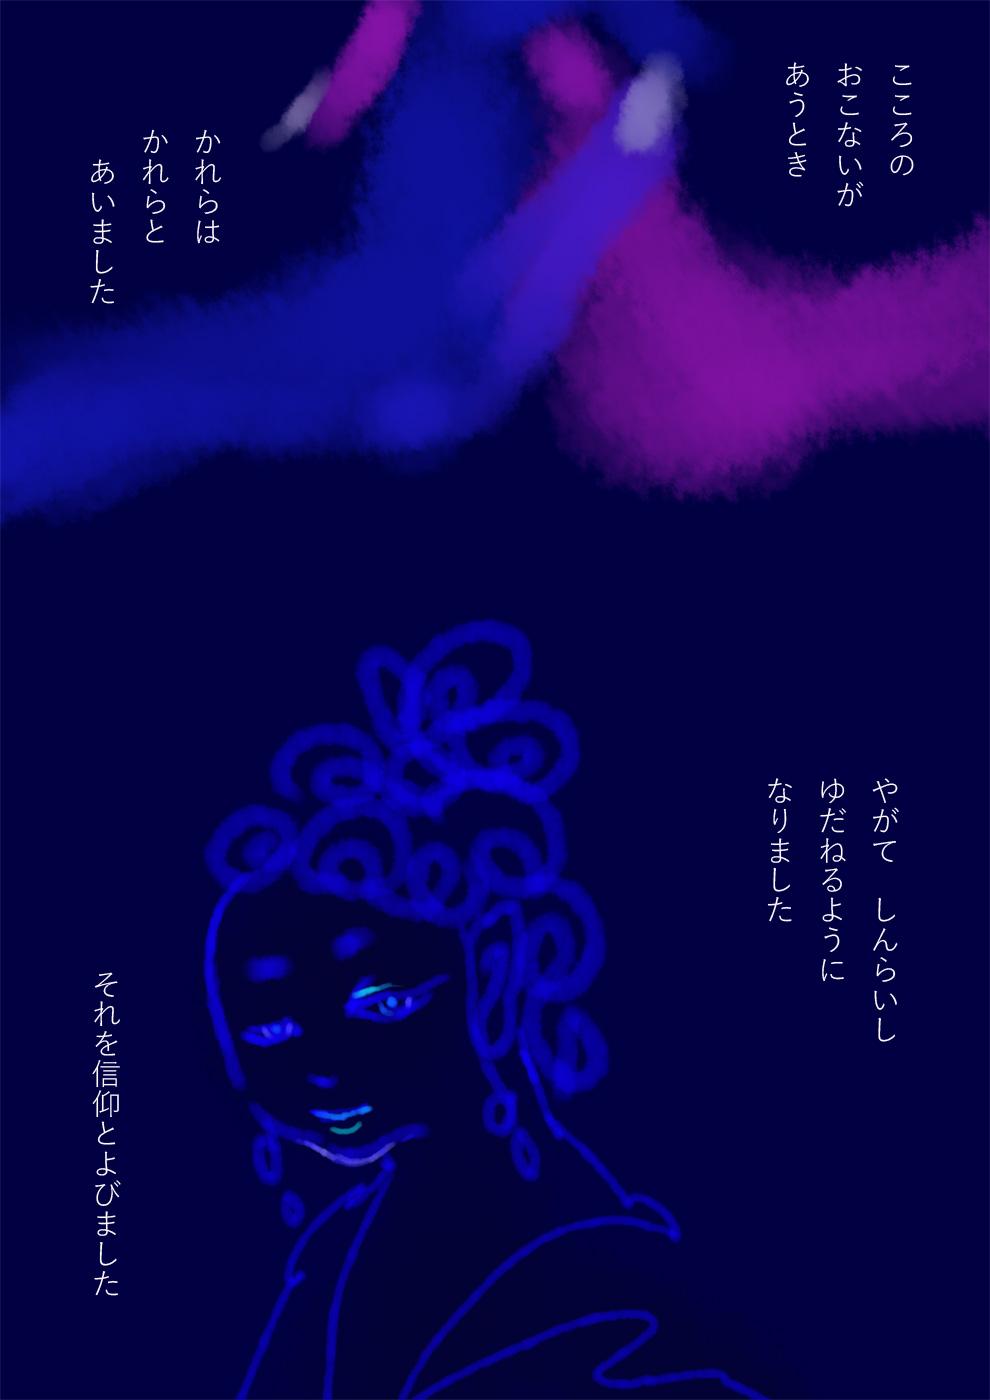 http://ahito.com/comic/ehon/voice/img/2018/20180324/04.jpg